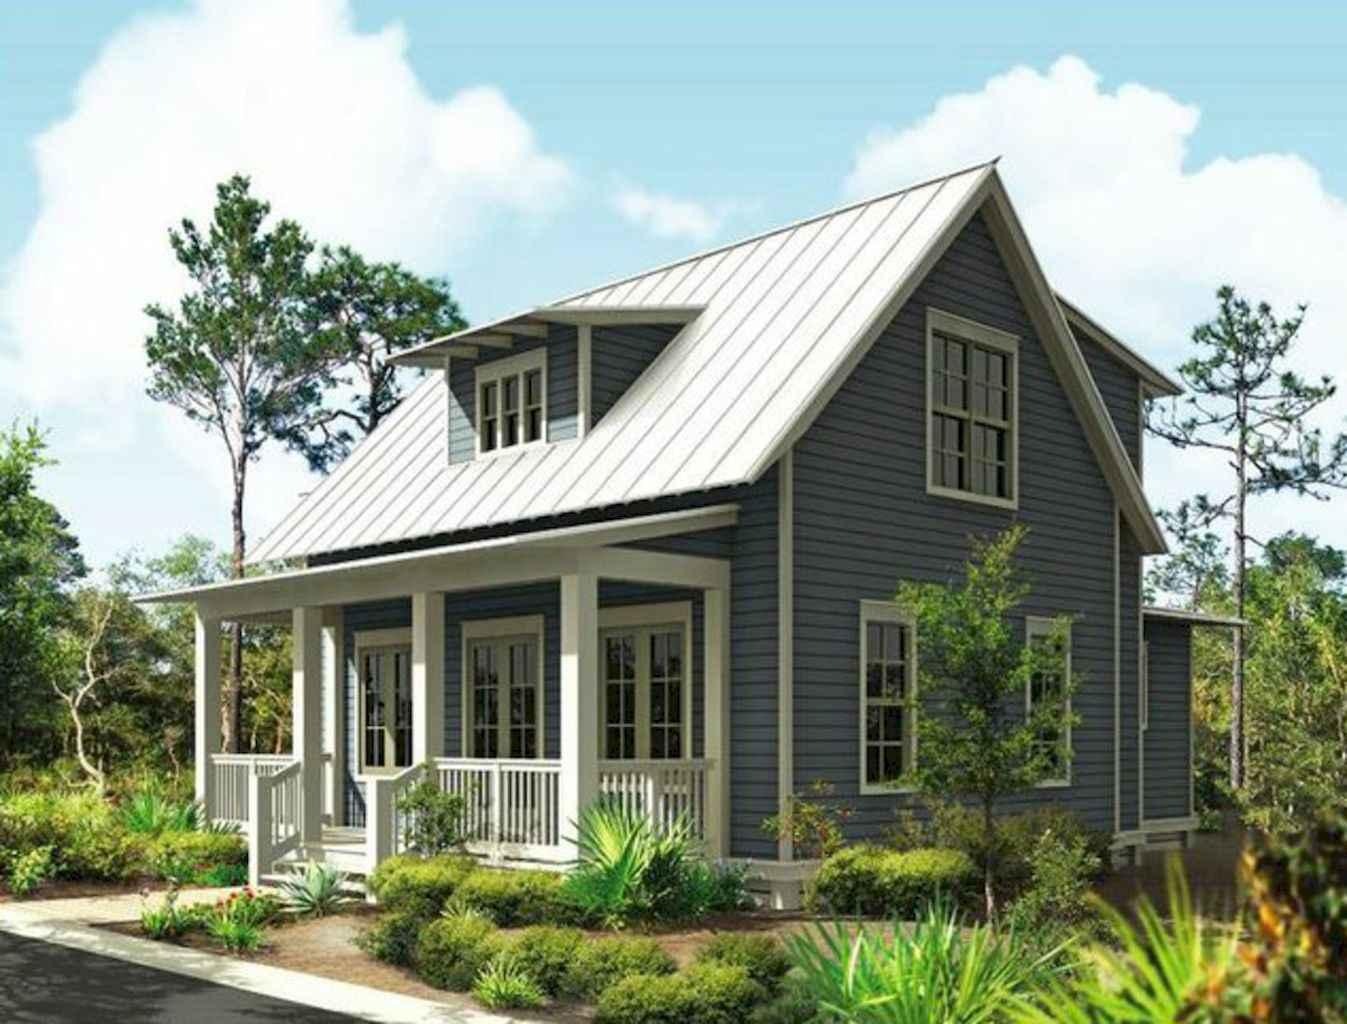 60 amazing farmhouse plans cracker style design ideas (51)